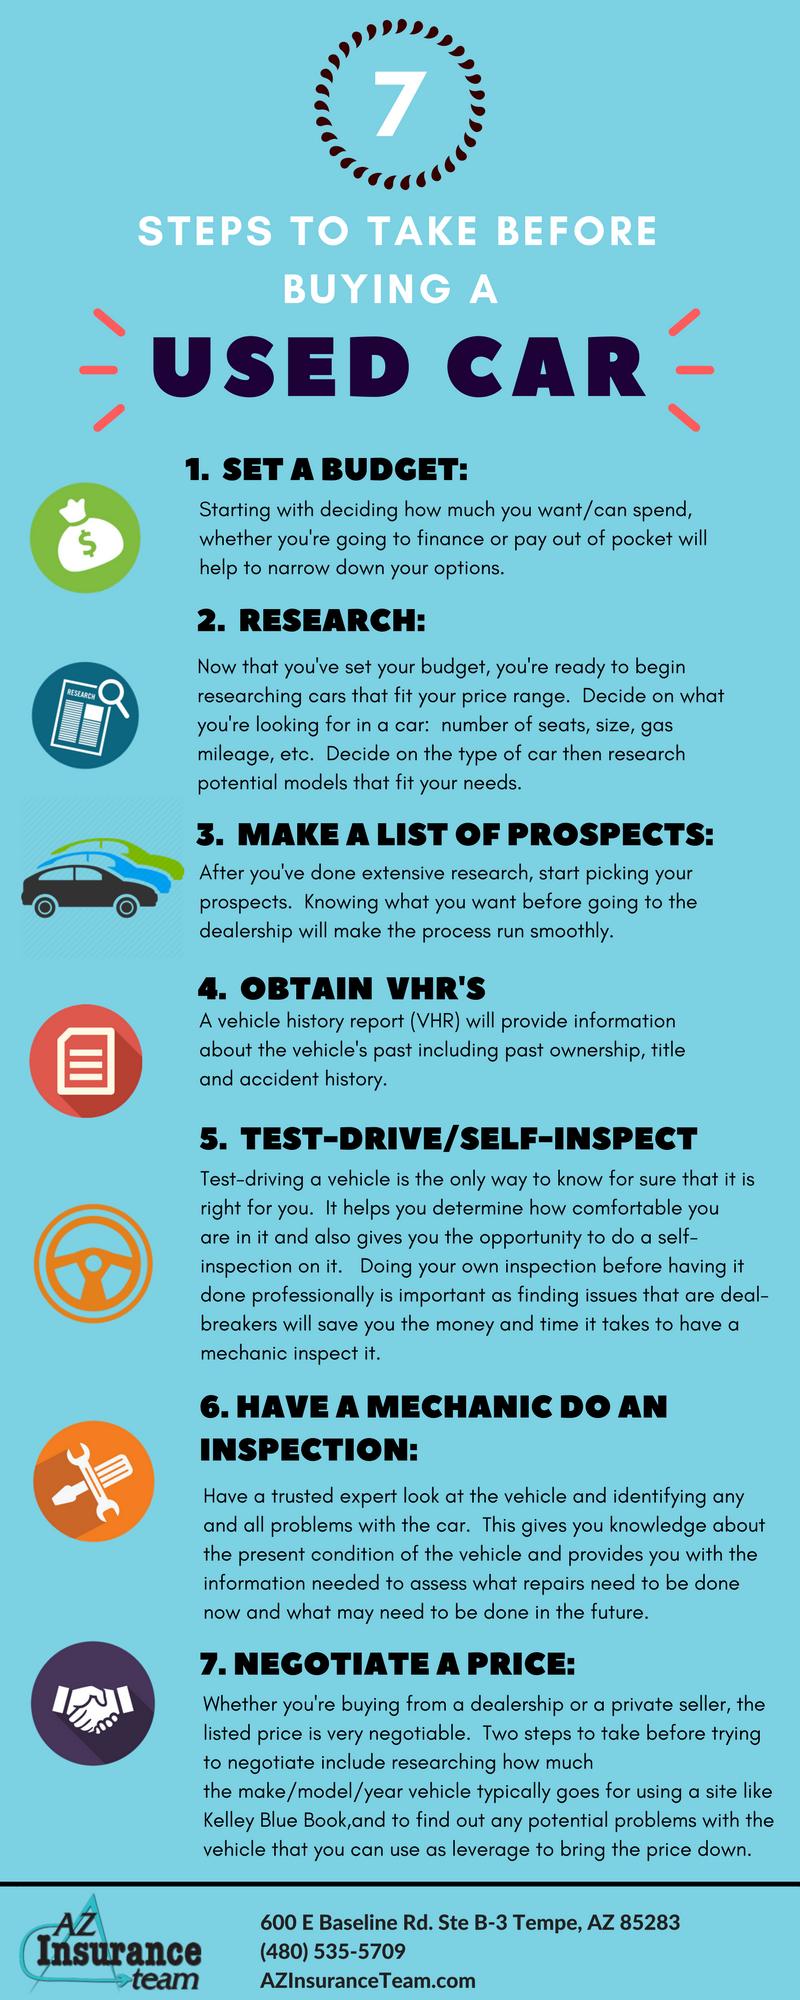 Az Insurance Team S Infographic Explaining 7 Steps You Need To